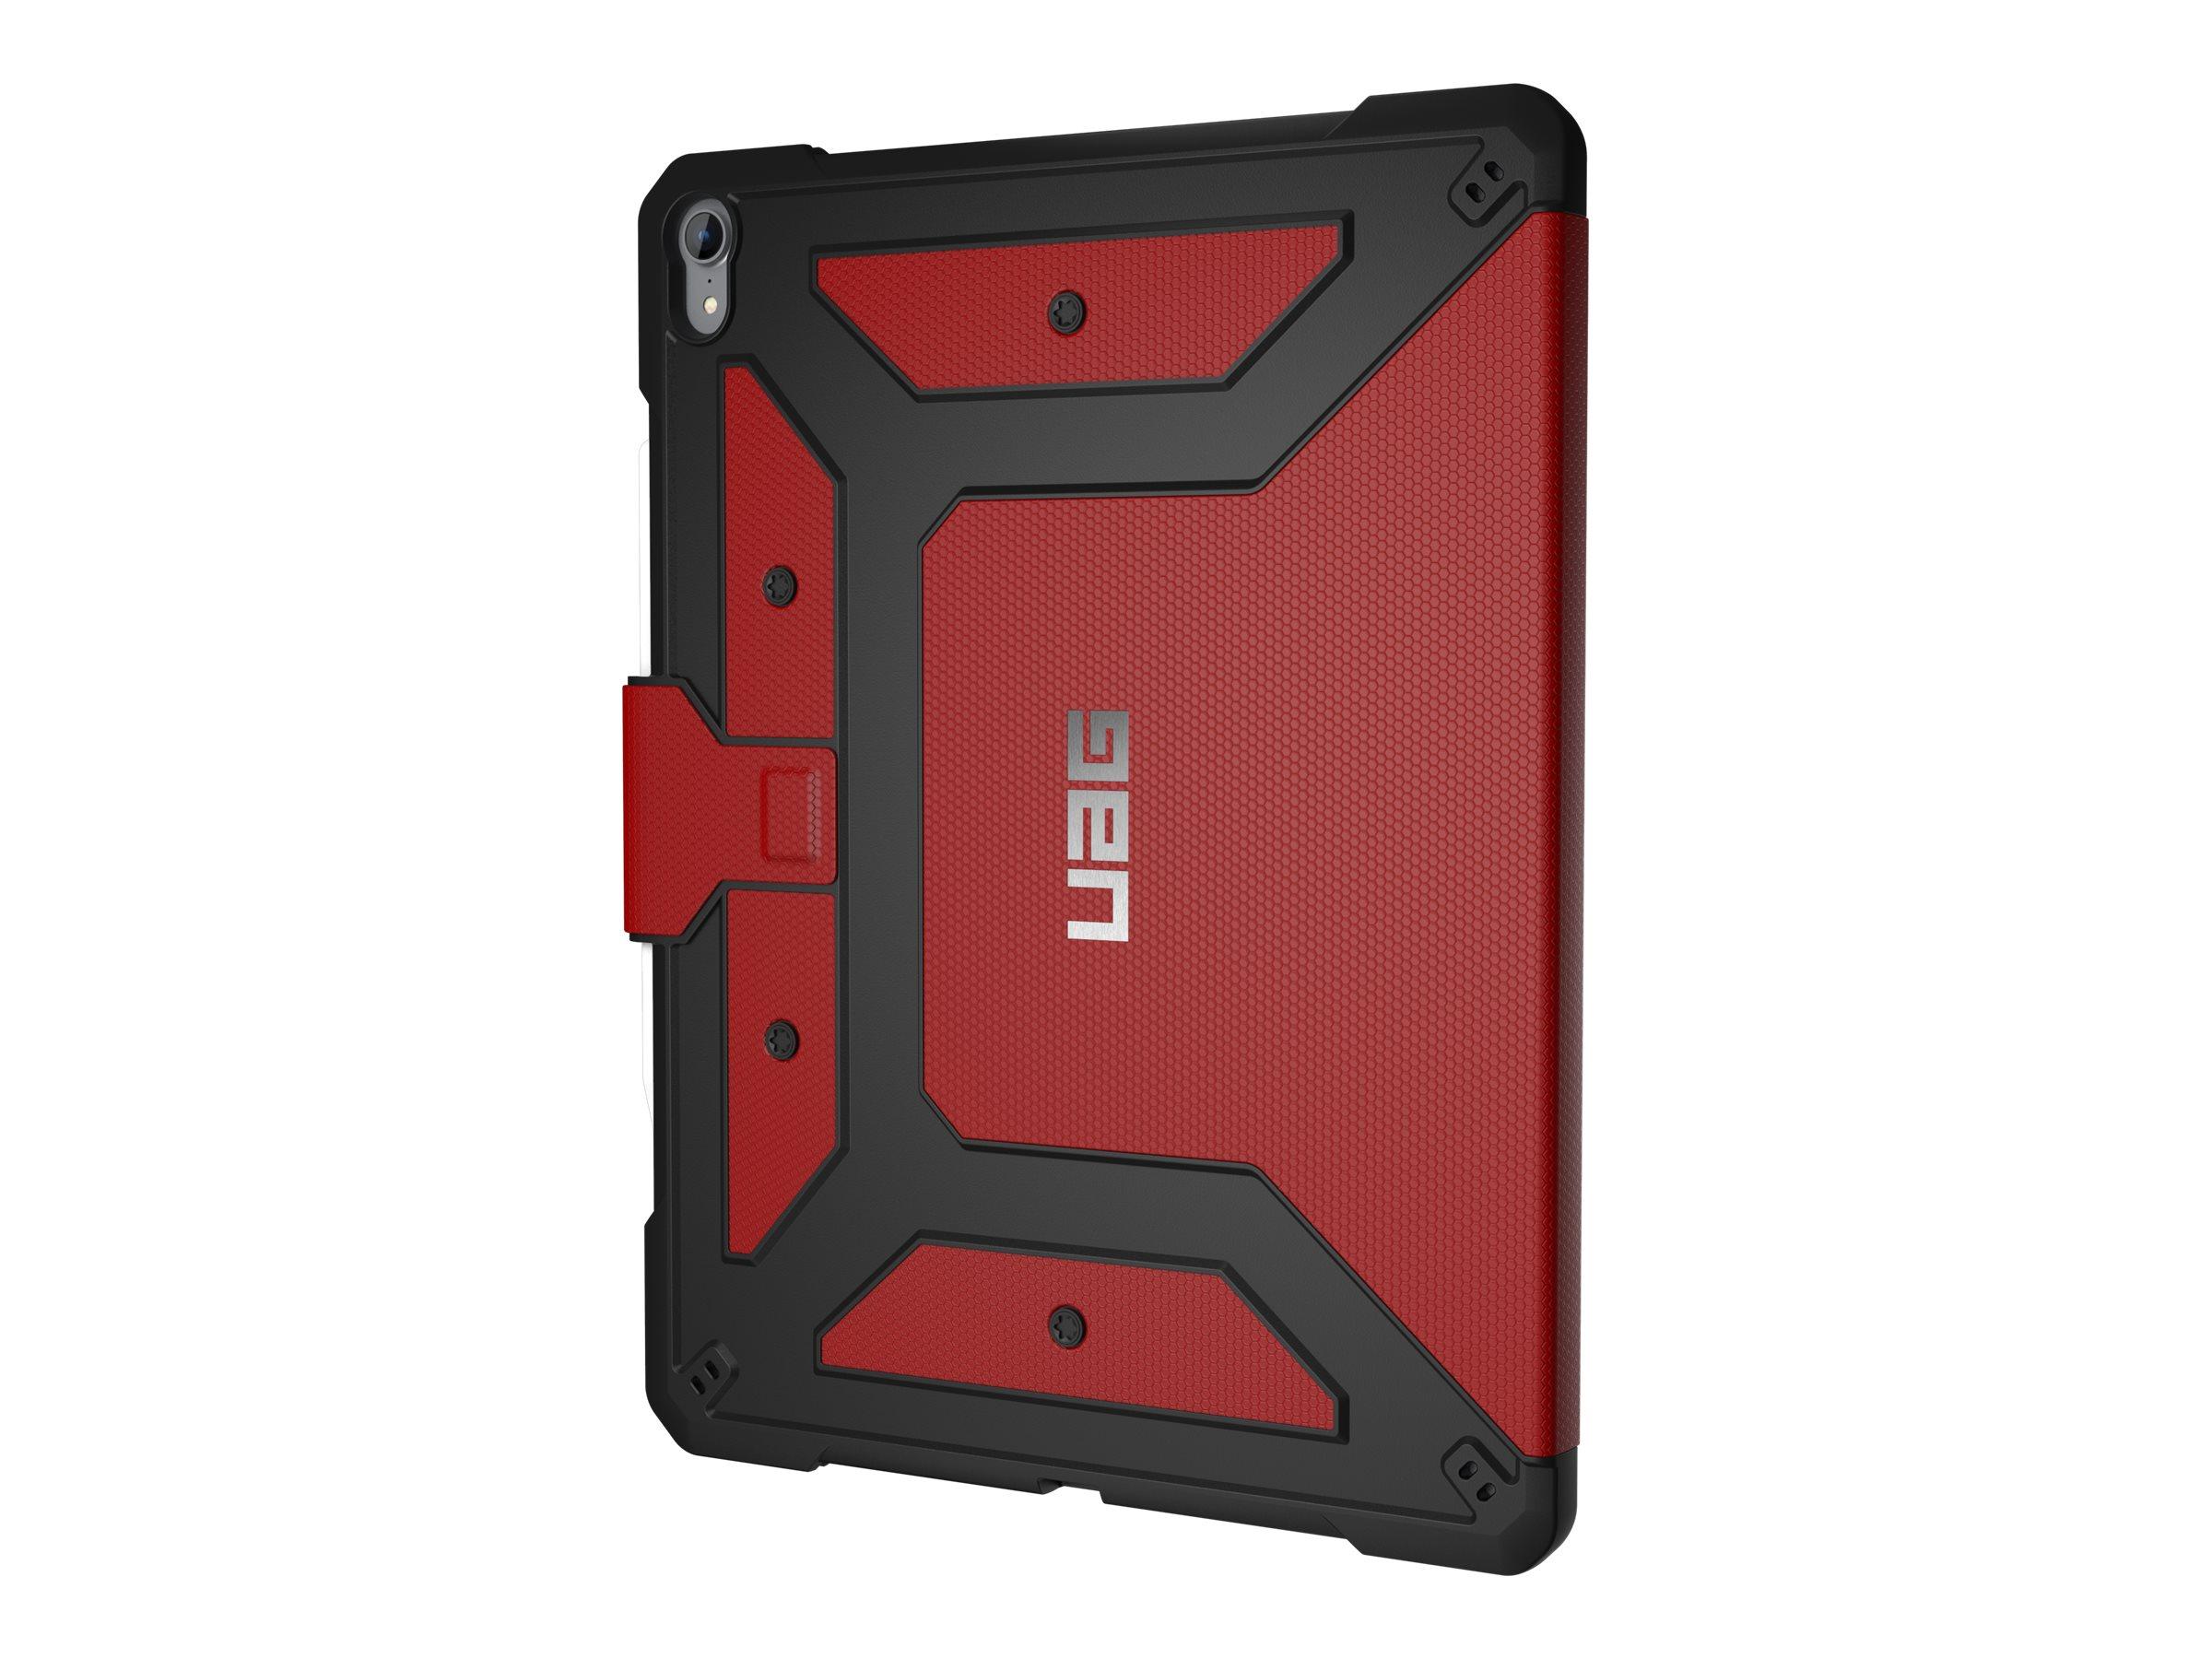 UAG Rugged Case for iPad Pro 12.9-inch (3rd Gen, 2018) - Metropolis Magma - Flip-Hülle für Tablet - Magma - für Apple 12.9-inch